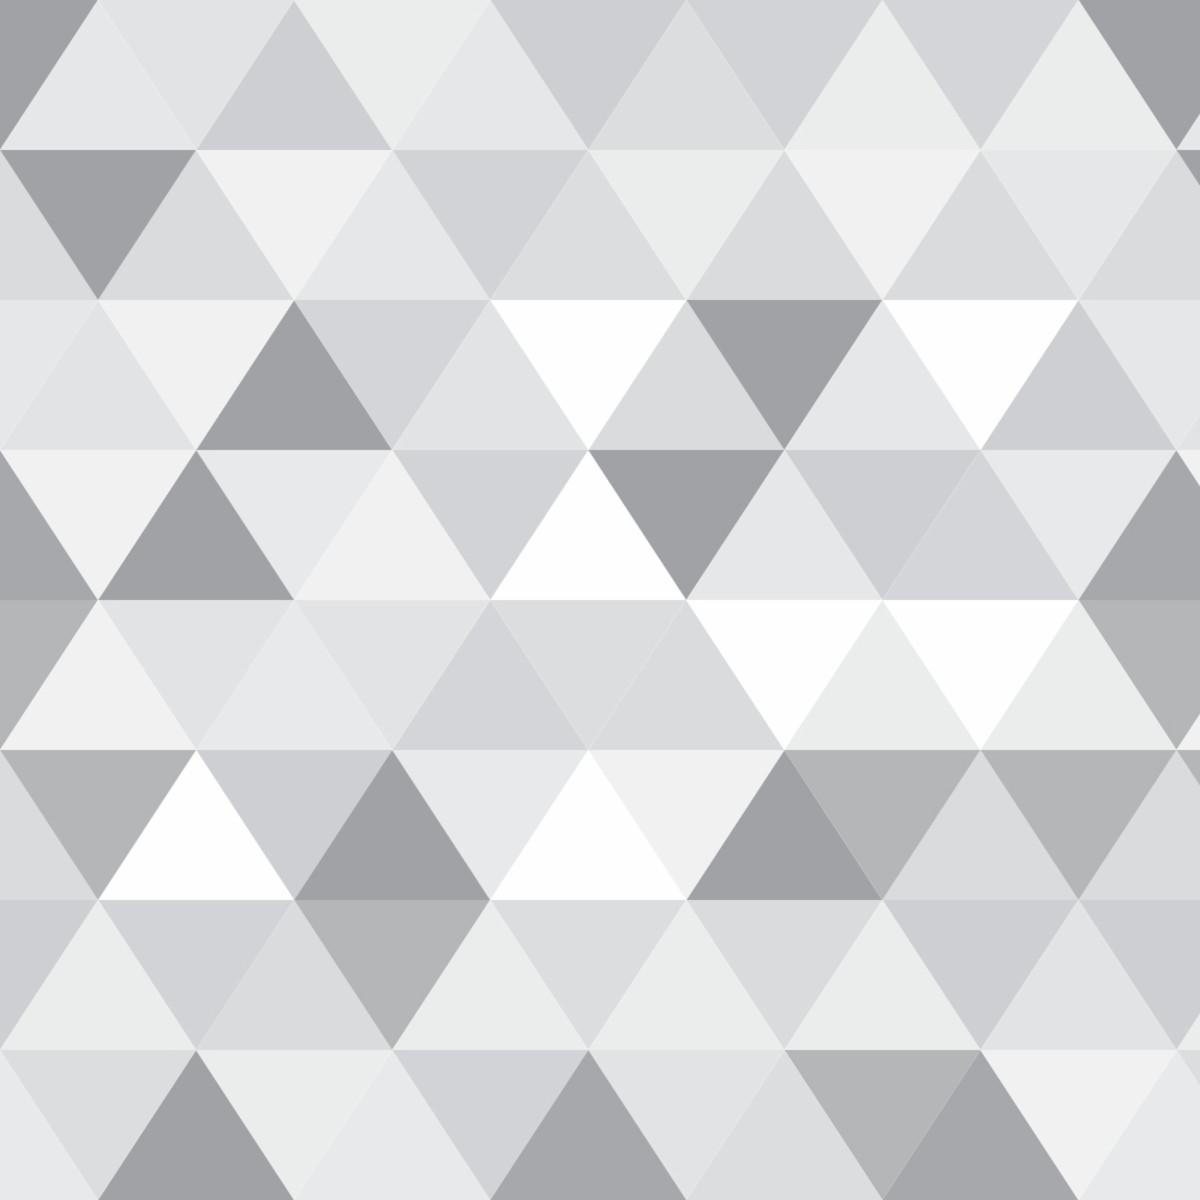 c8fdf63cd Papel Parede Geométrico Triângulo Tons Cinza Sala 3m PPG209 no Elo7 ...